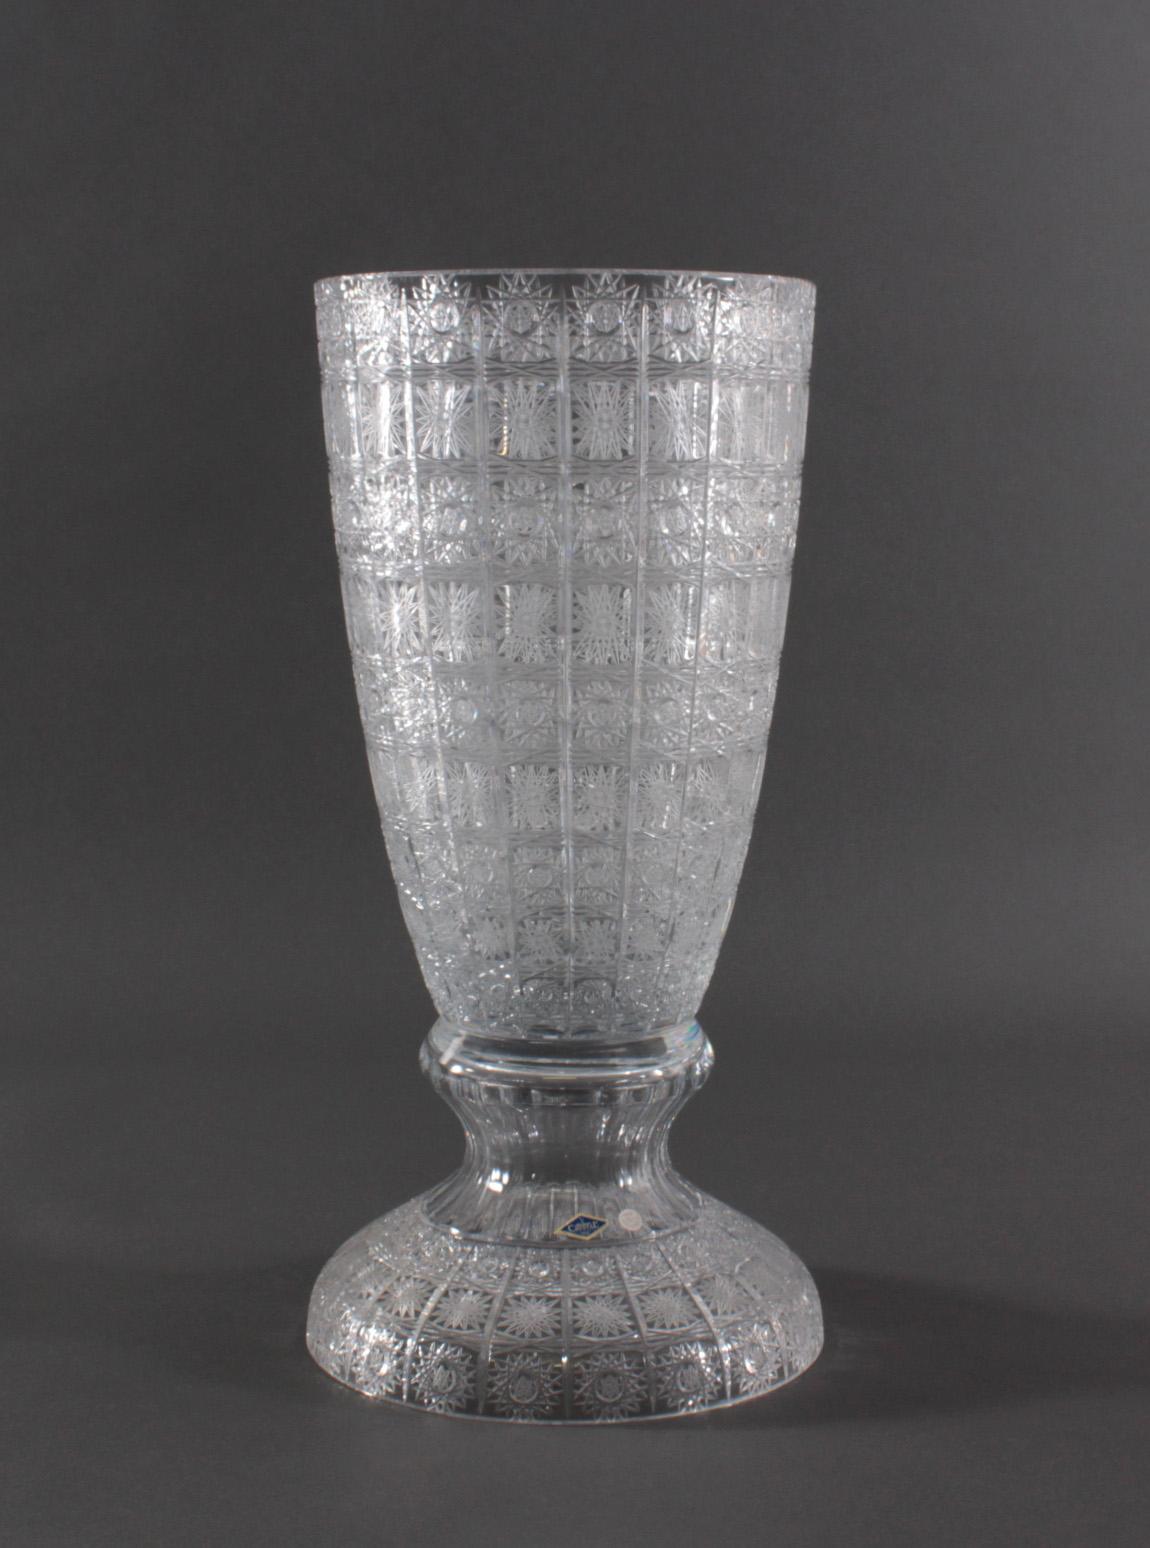 Sehr große dekorative Bleikristall-Vase. Bohemia Aurum